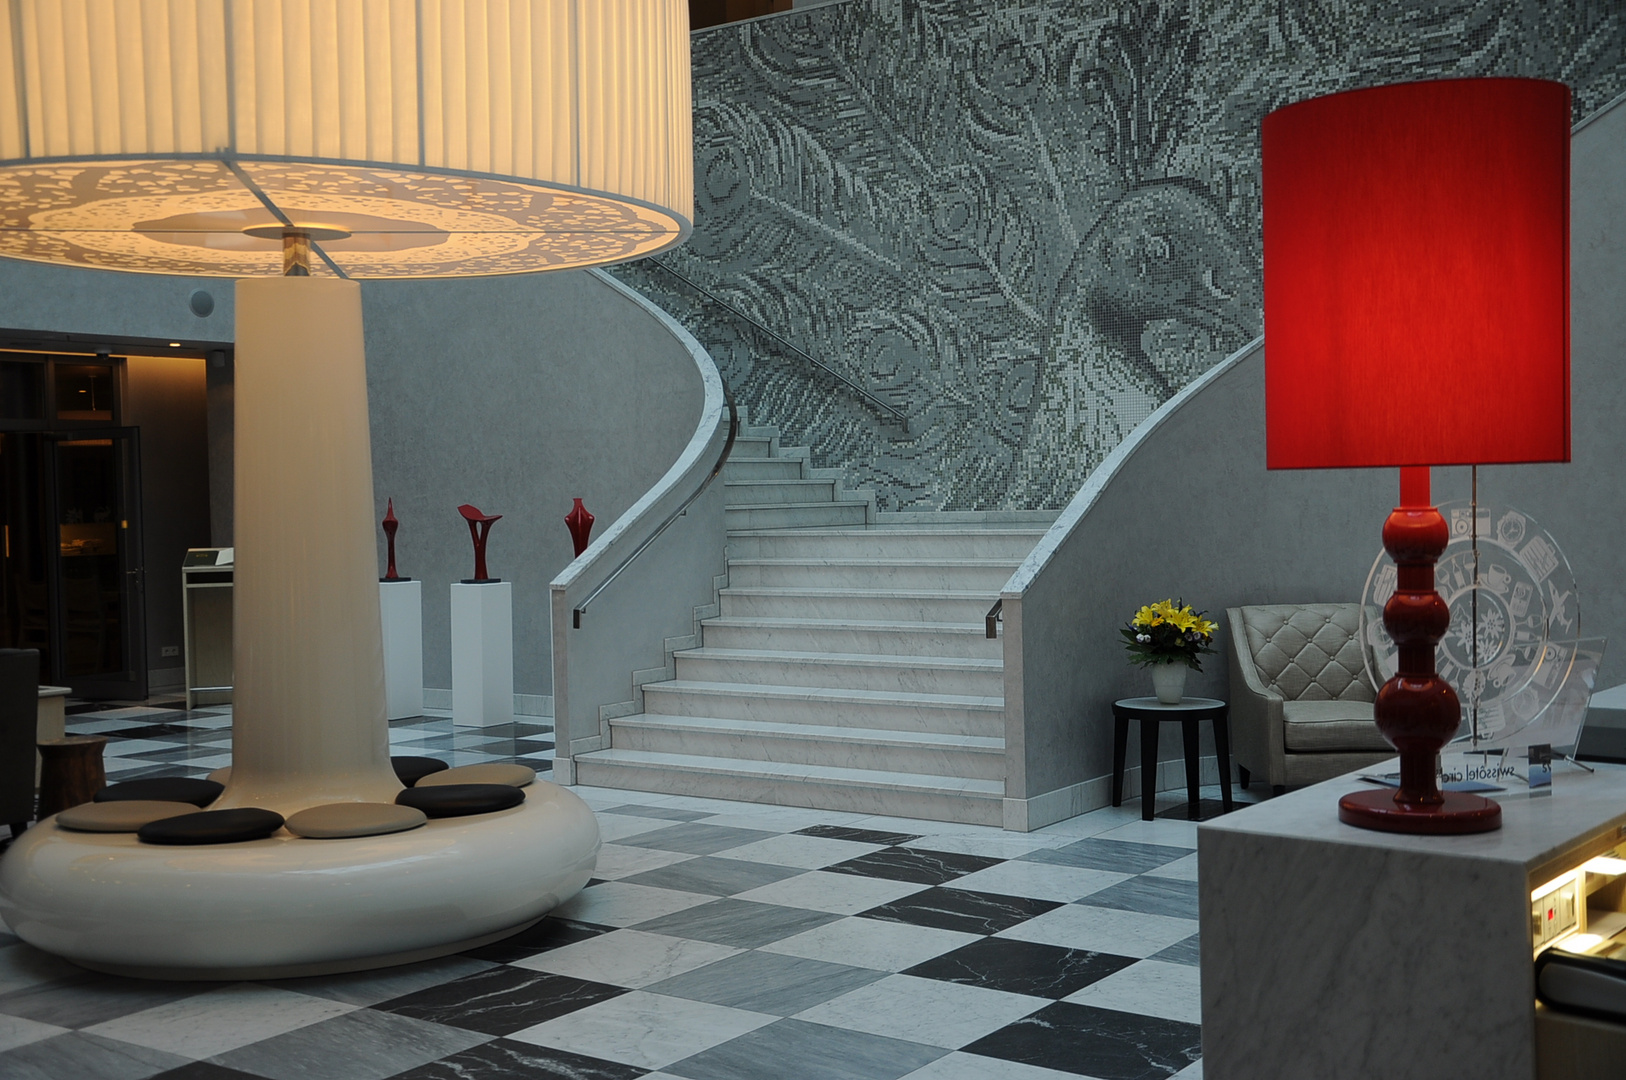 Swiss Hotel Dresden Foto Bild Projekte Montagskramen